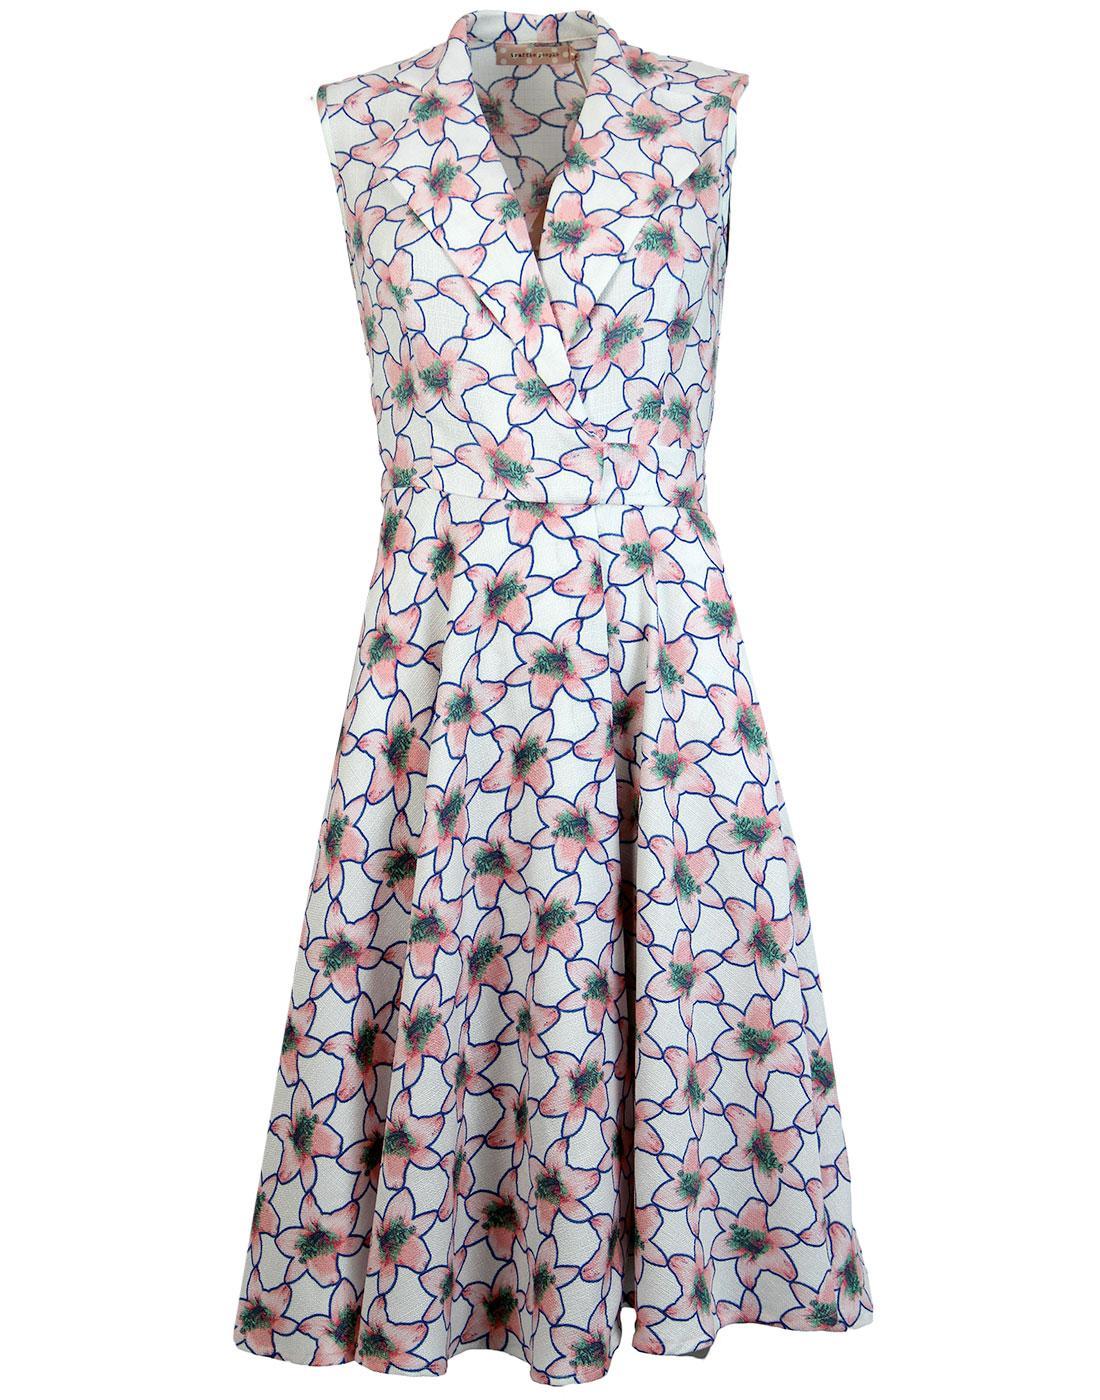 Prom TRAFFIC PEOPLE 70's Retro Flower Wrap Dress